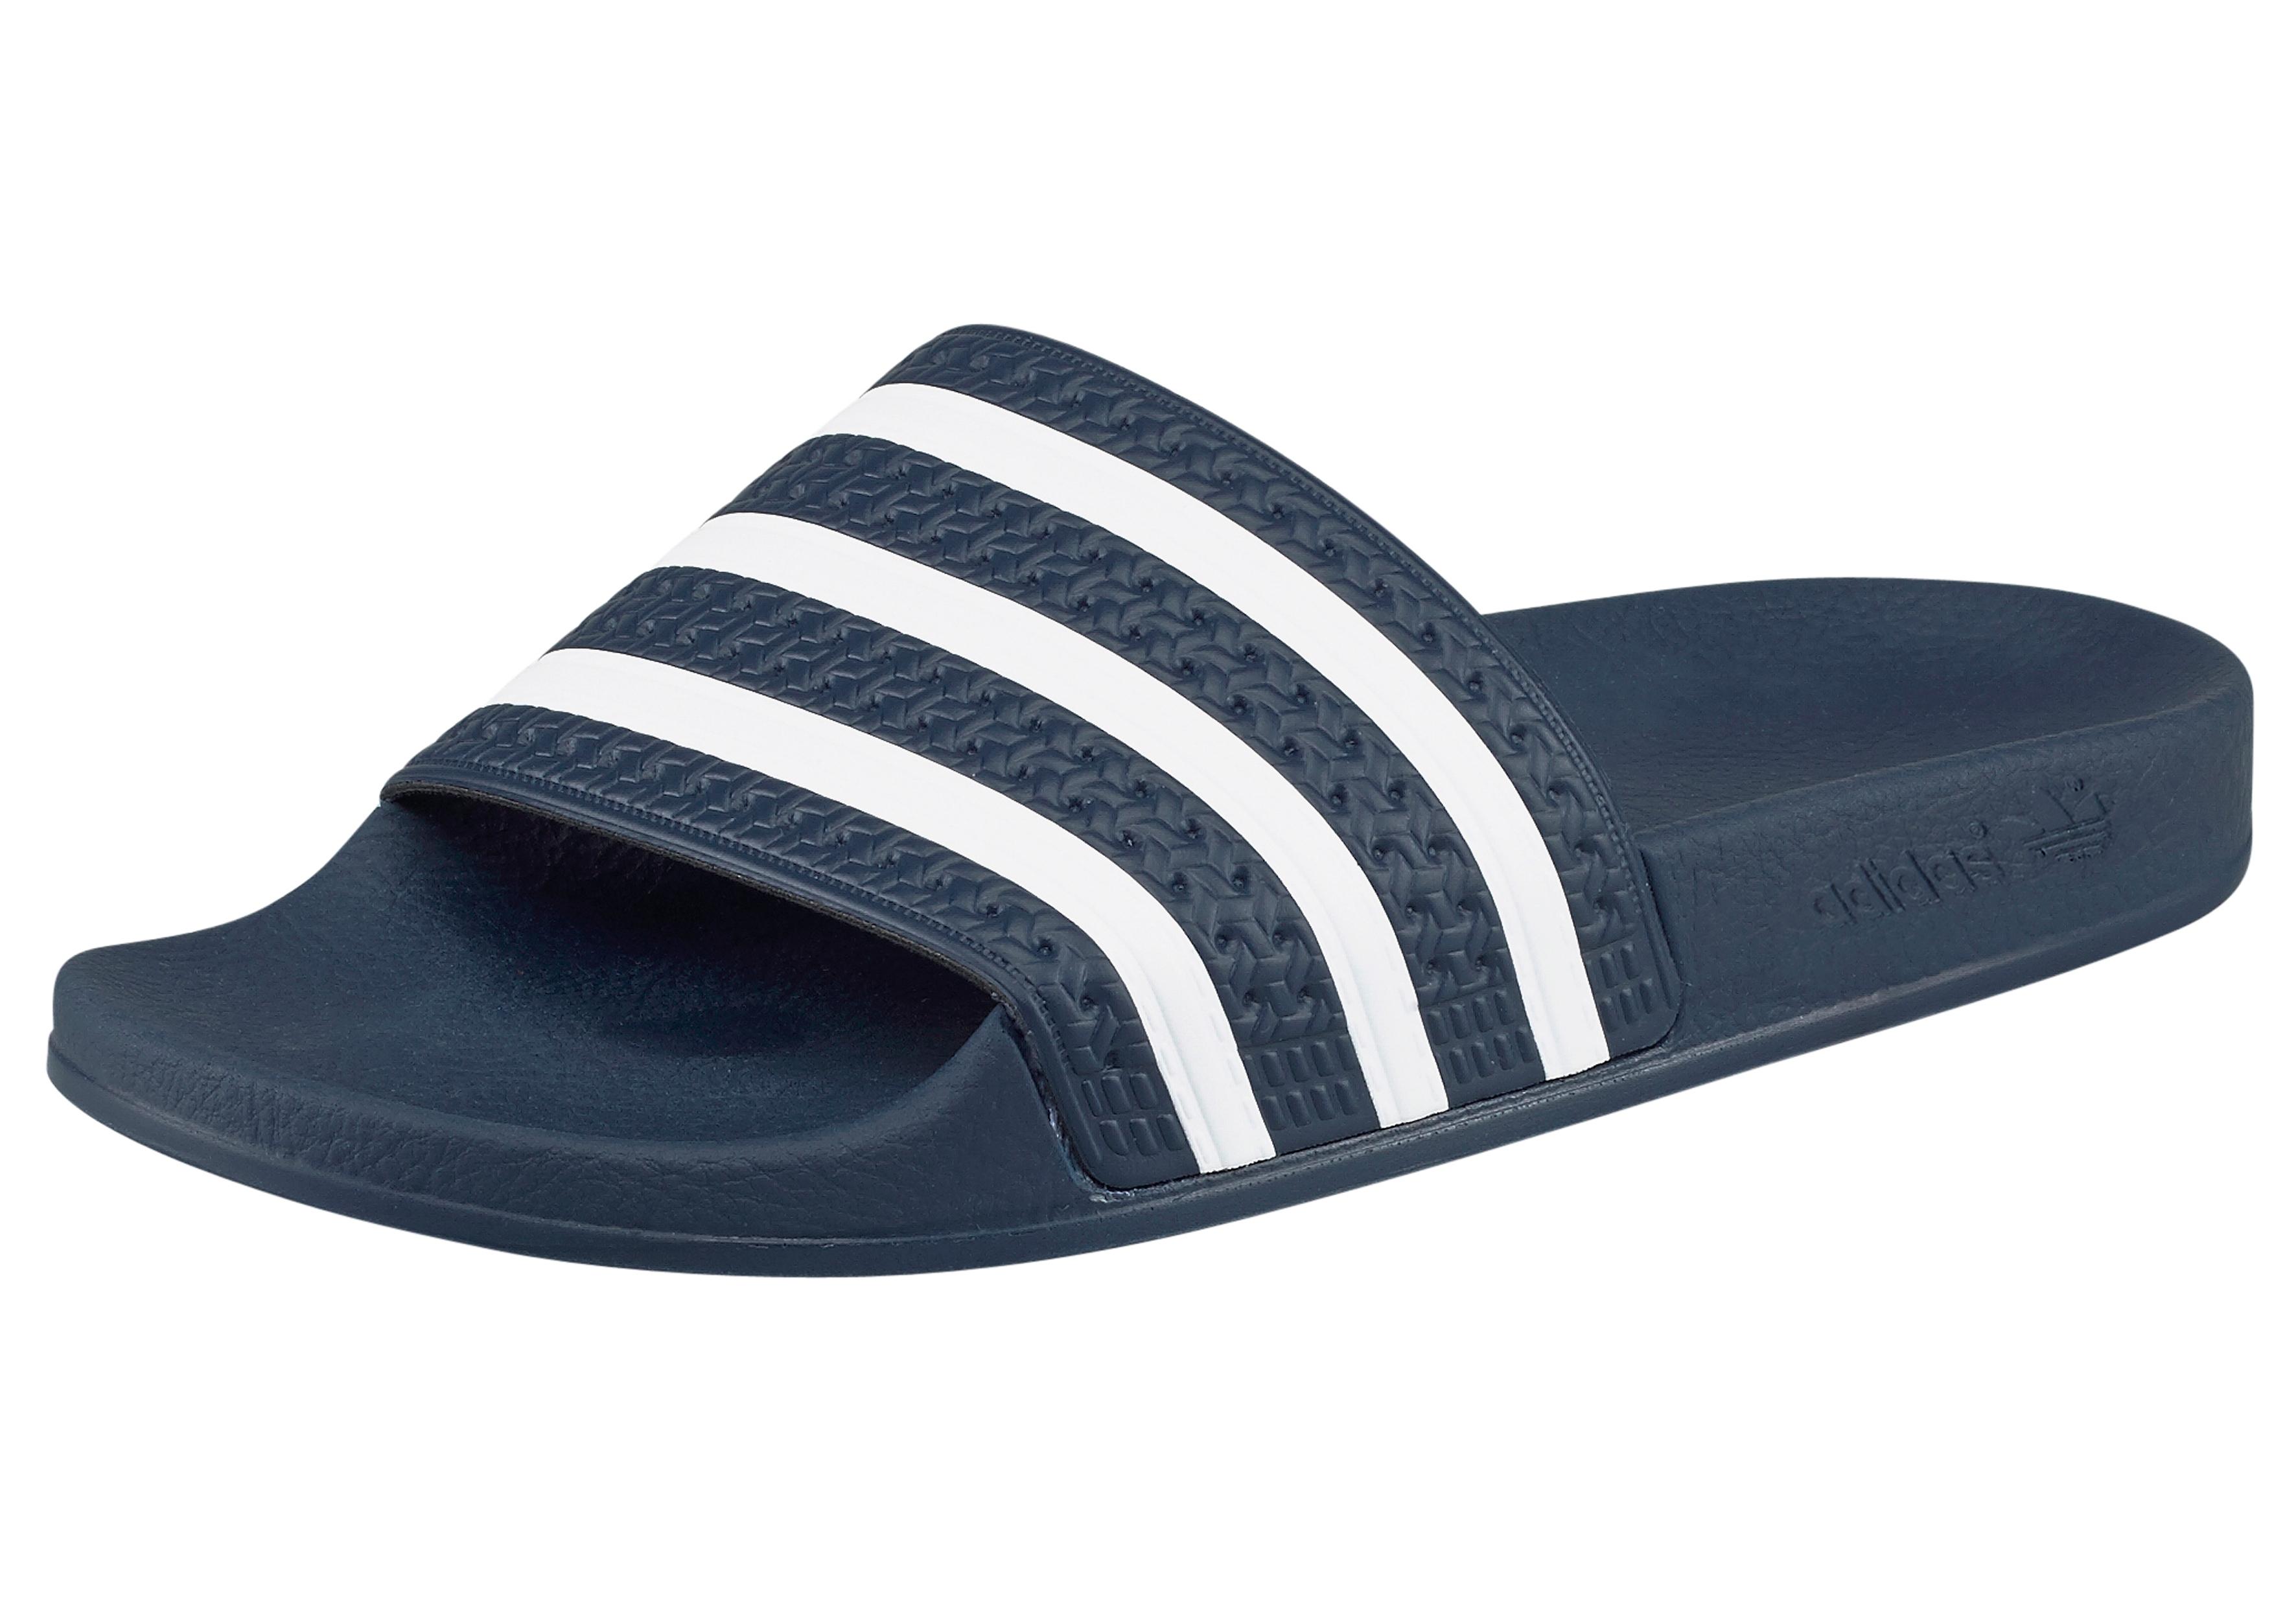 adidas Originals Badslippers Adilette online kopen op otto.nl